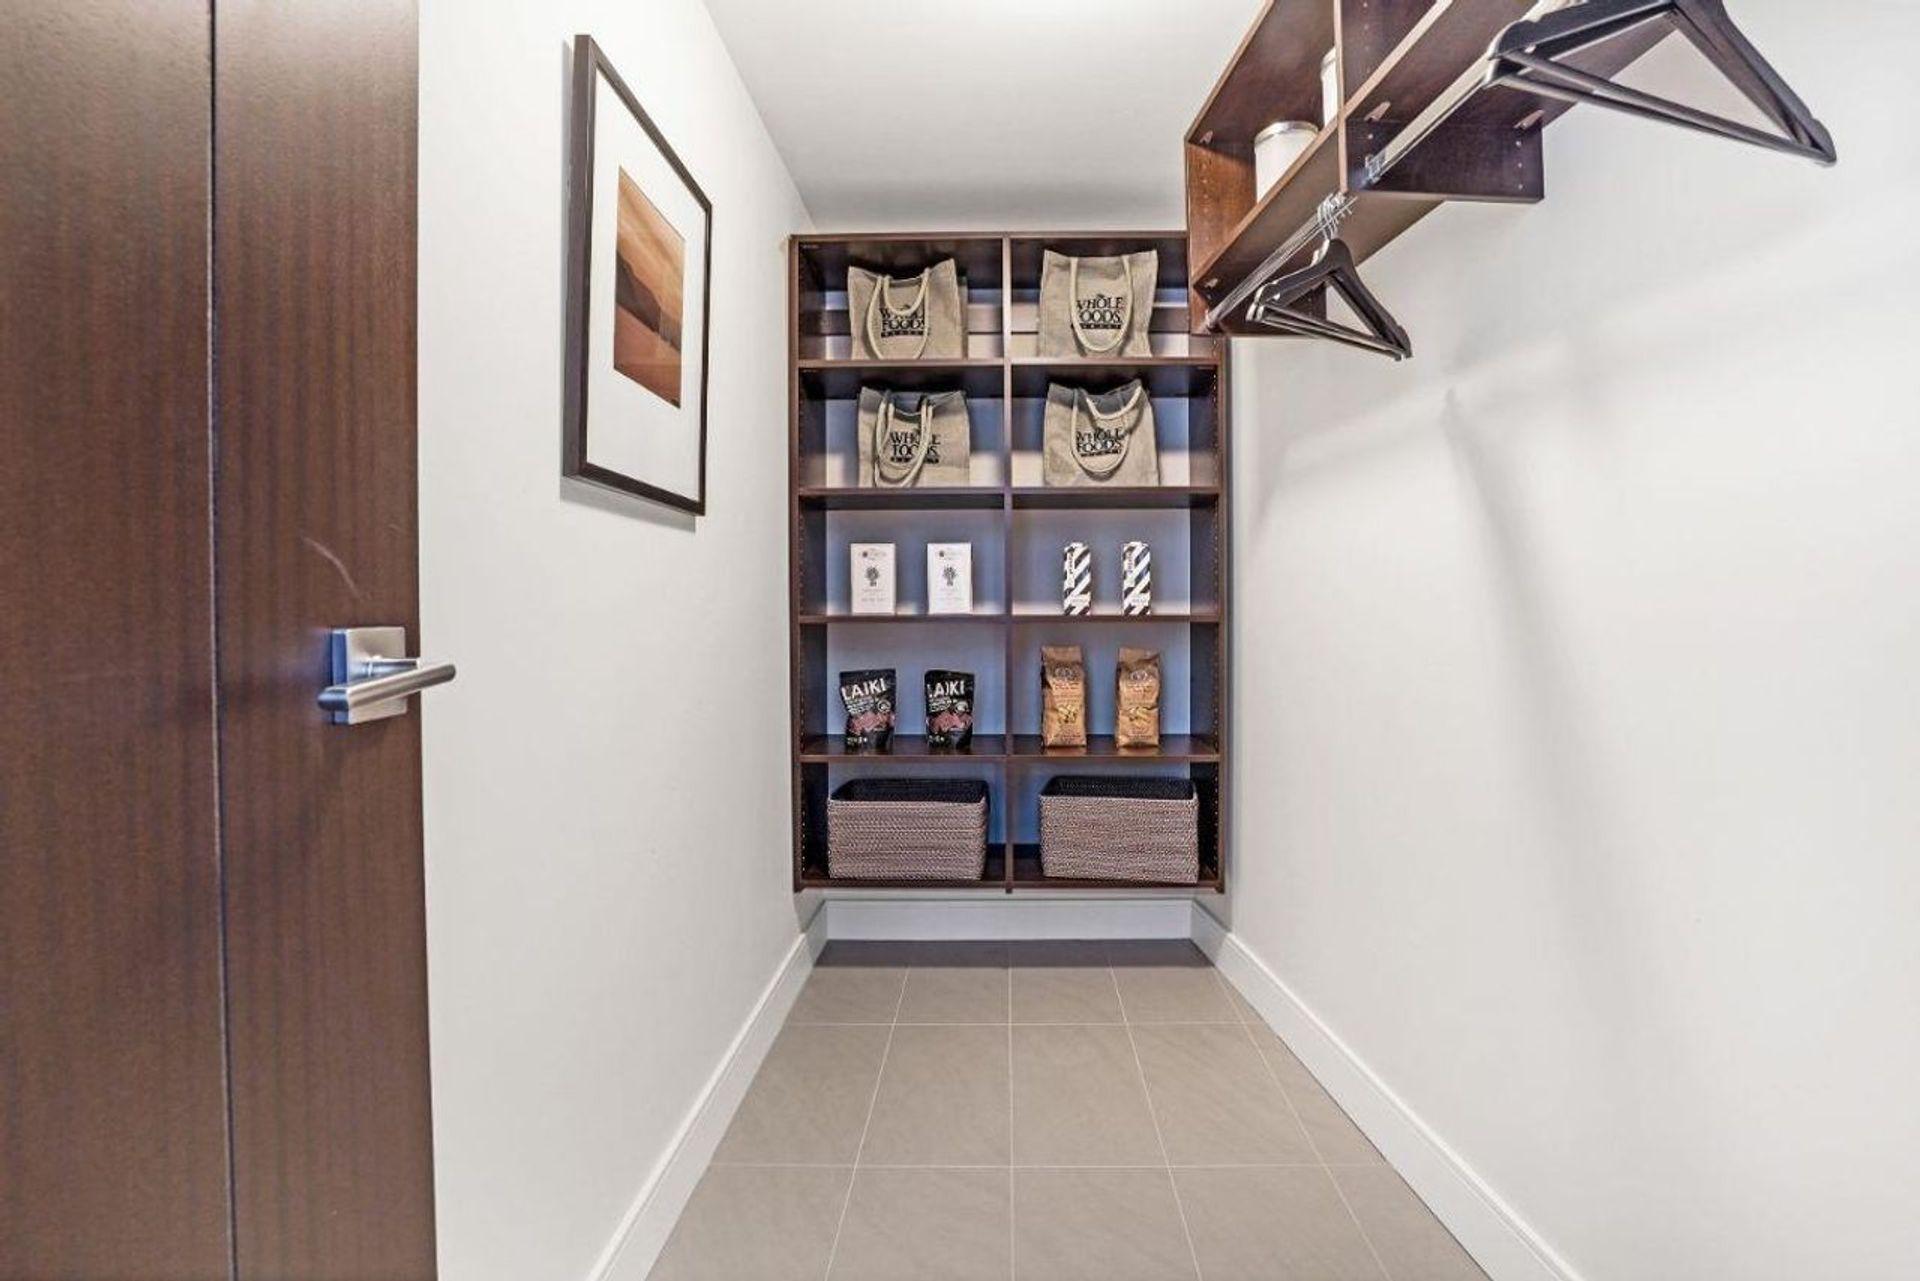 210-salter-street-queensborough-new-westminster-10 at 1007 - 210 Salter Street, Queensborough, New Westminster